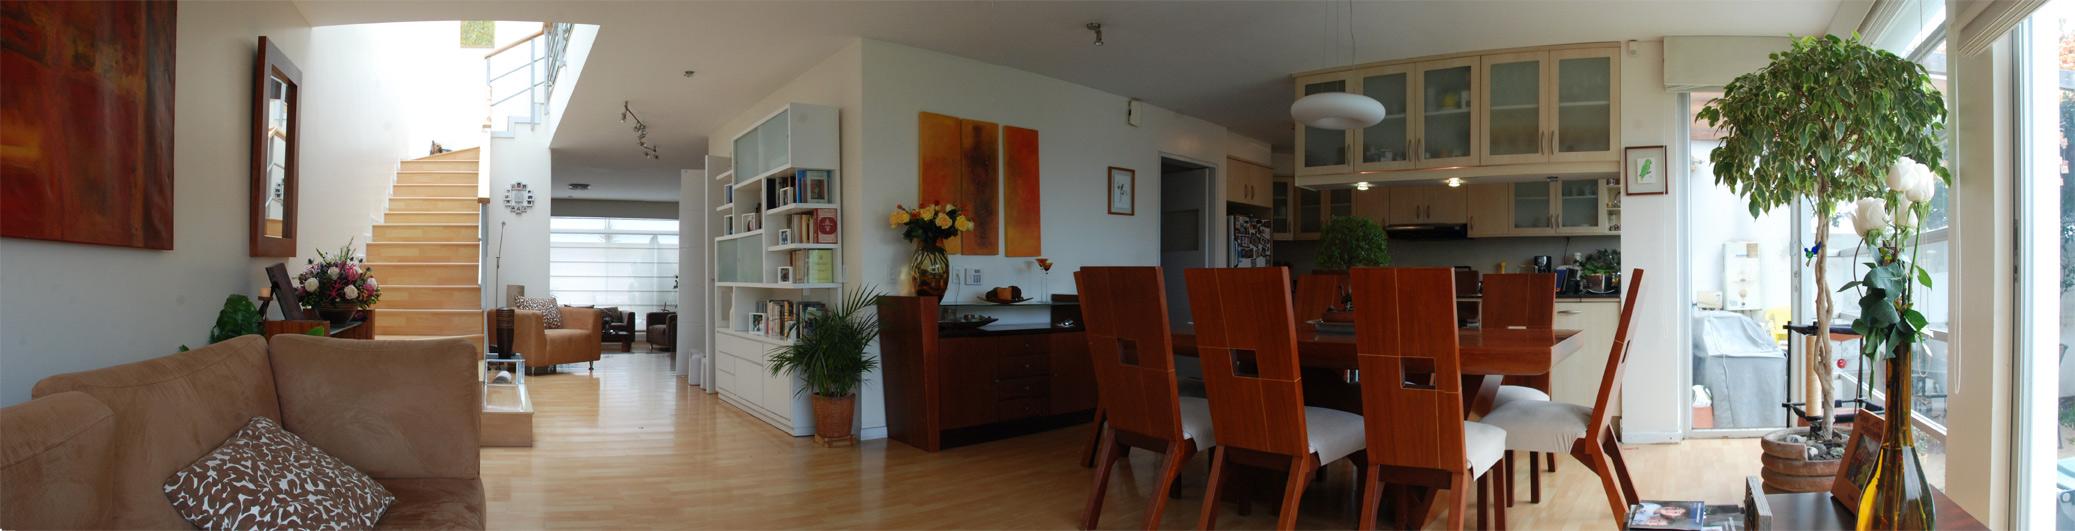 Apartments Houses For Rent Quito Ecuador Living In Ecuador # Muebles Cumbaya Ecuador